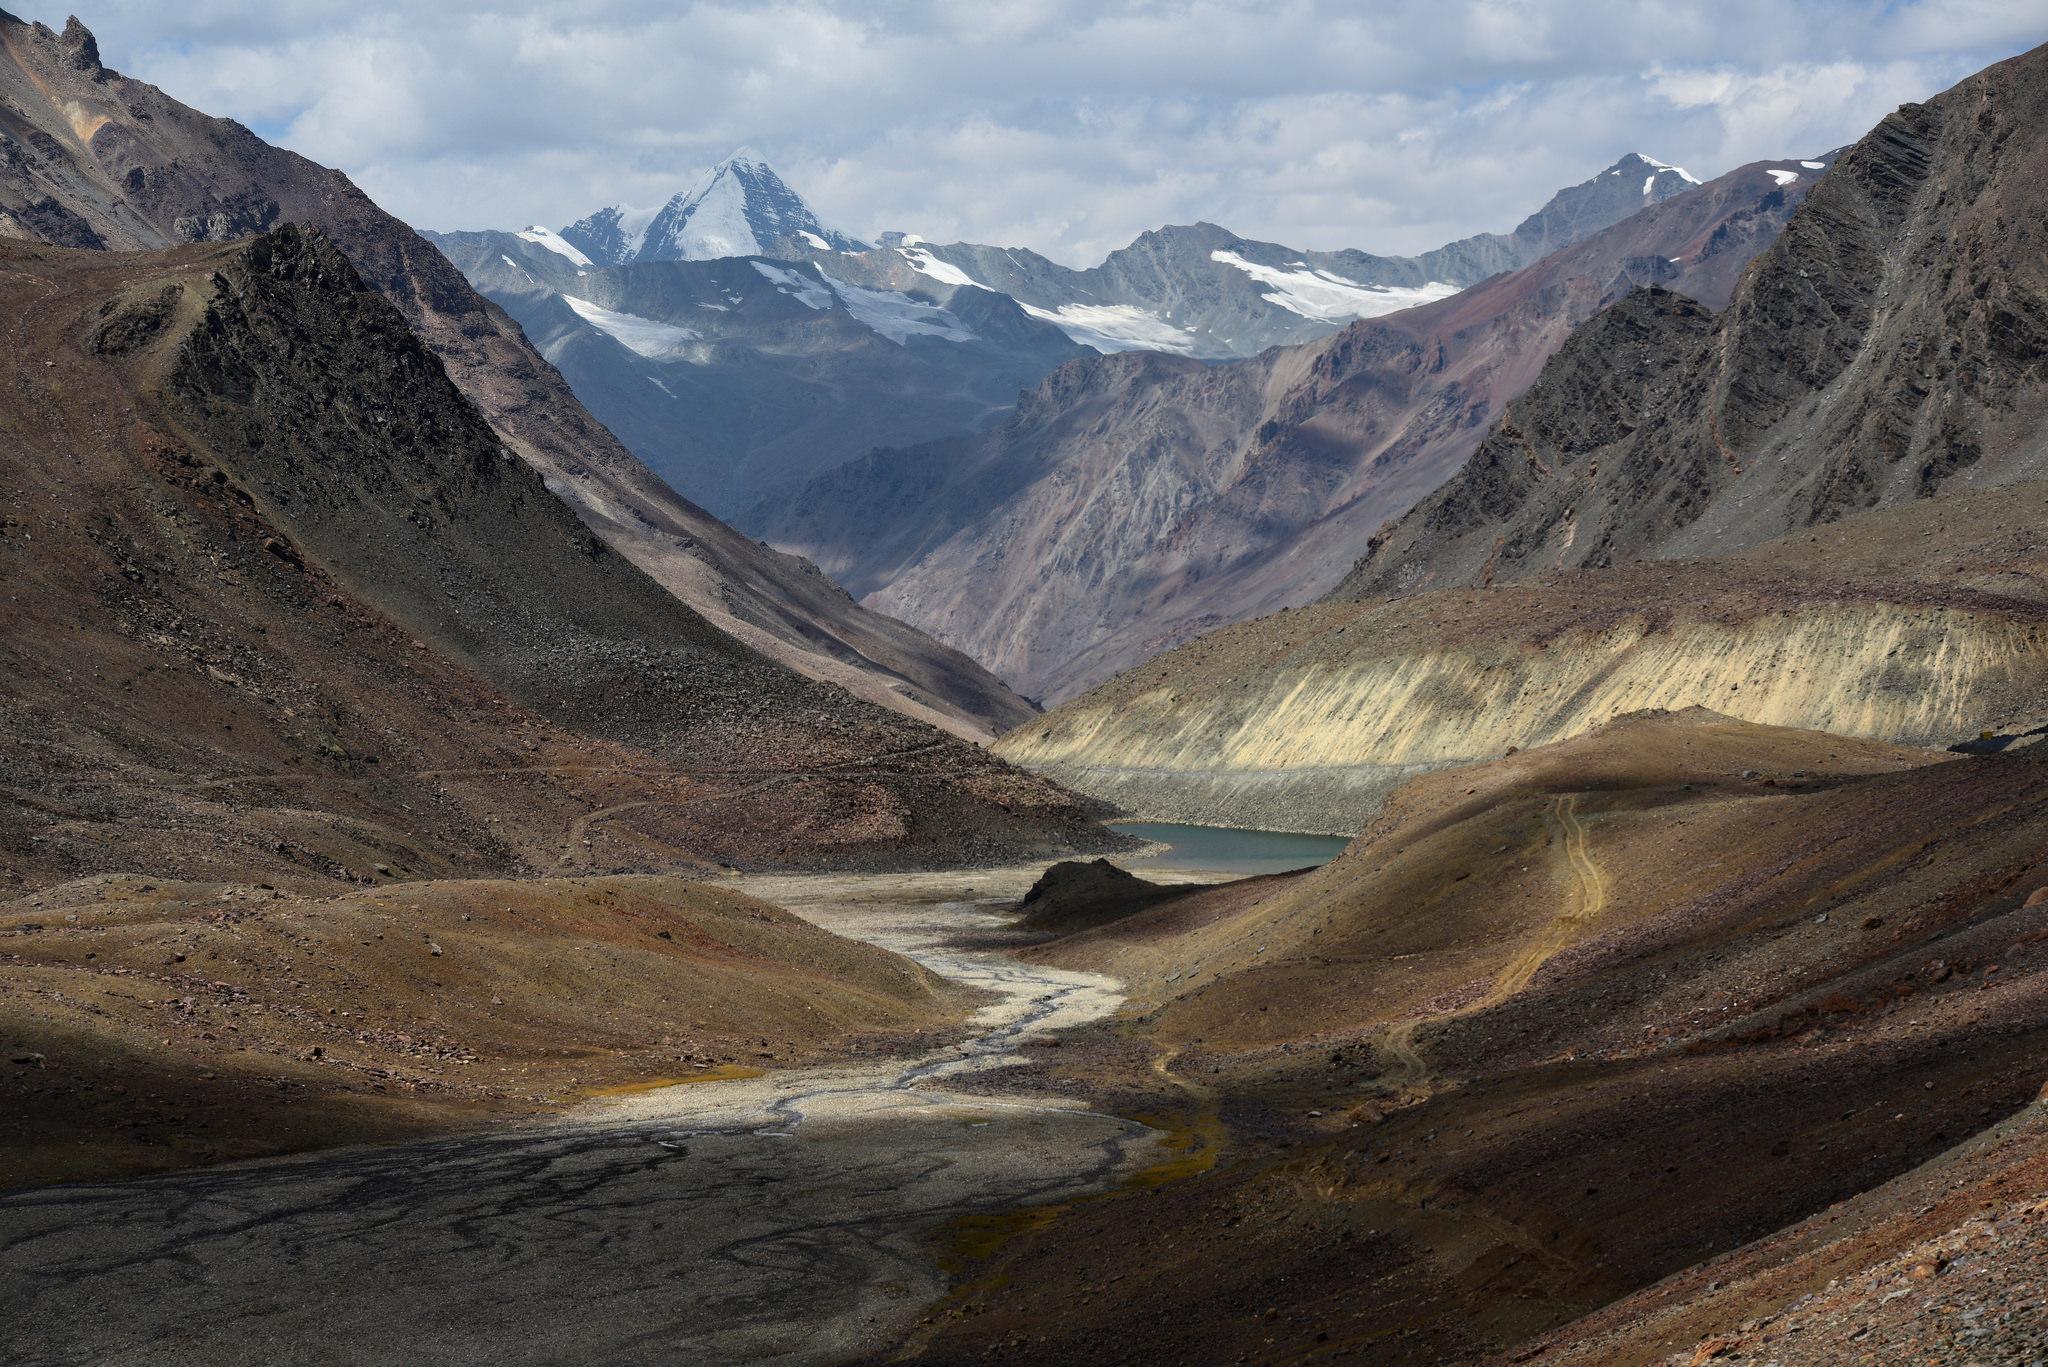 Near Bara-lacha la pass, India 2016 by reurinkjan